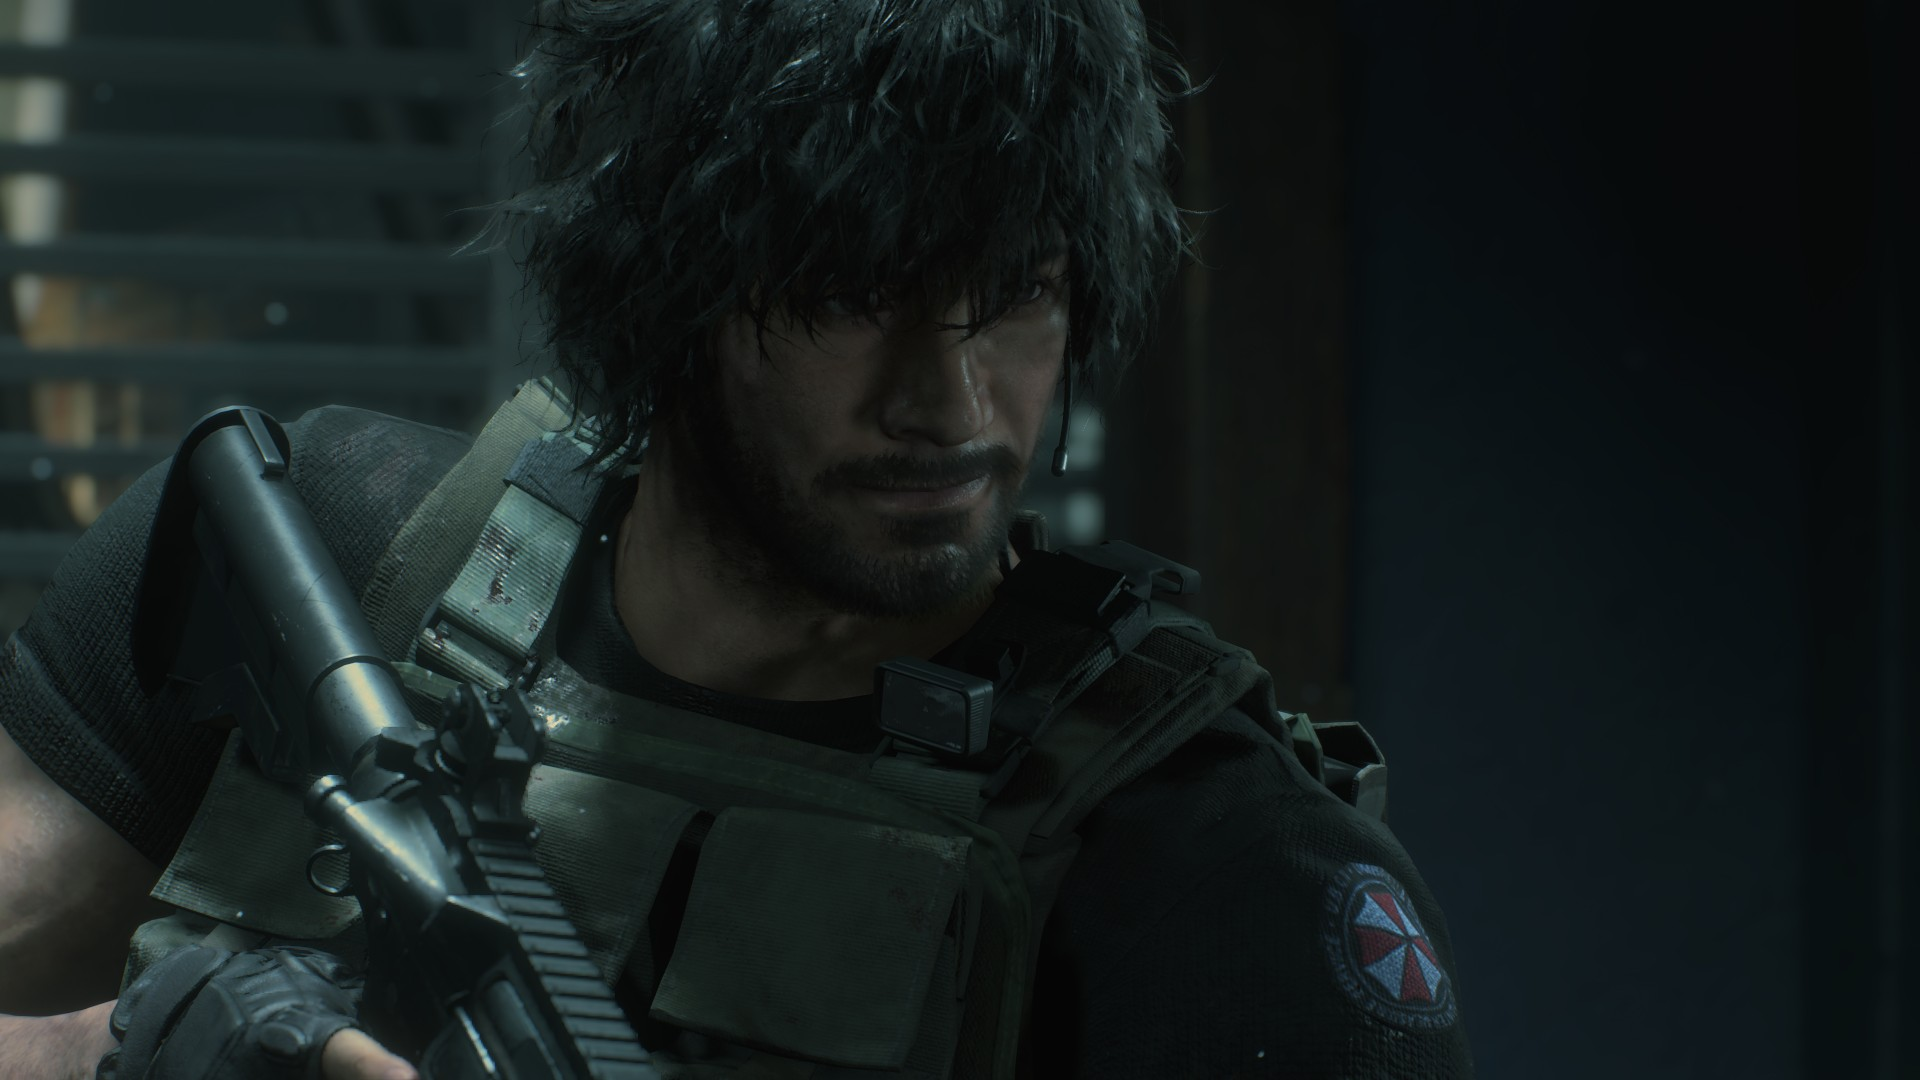 Resident Evil 3 voice actors Carlos Oliveira Jeff Schine